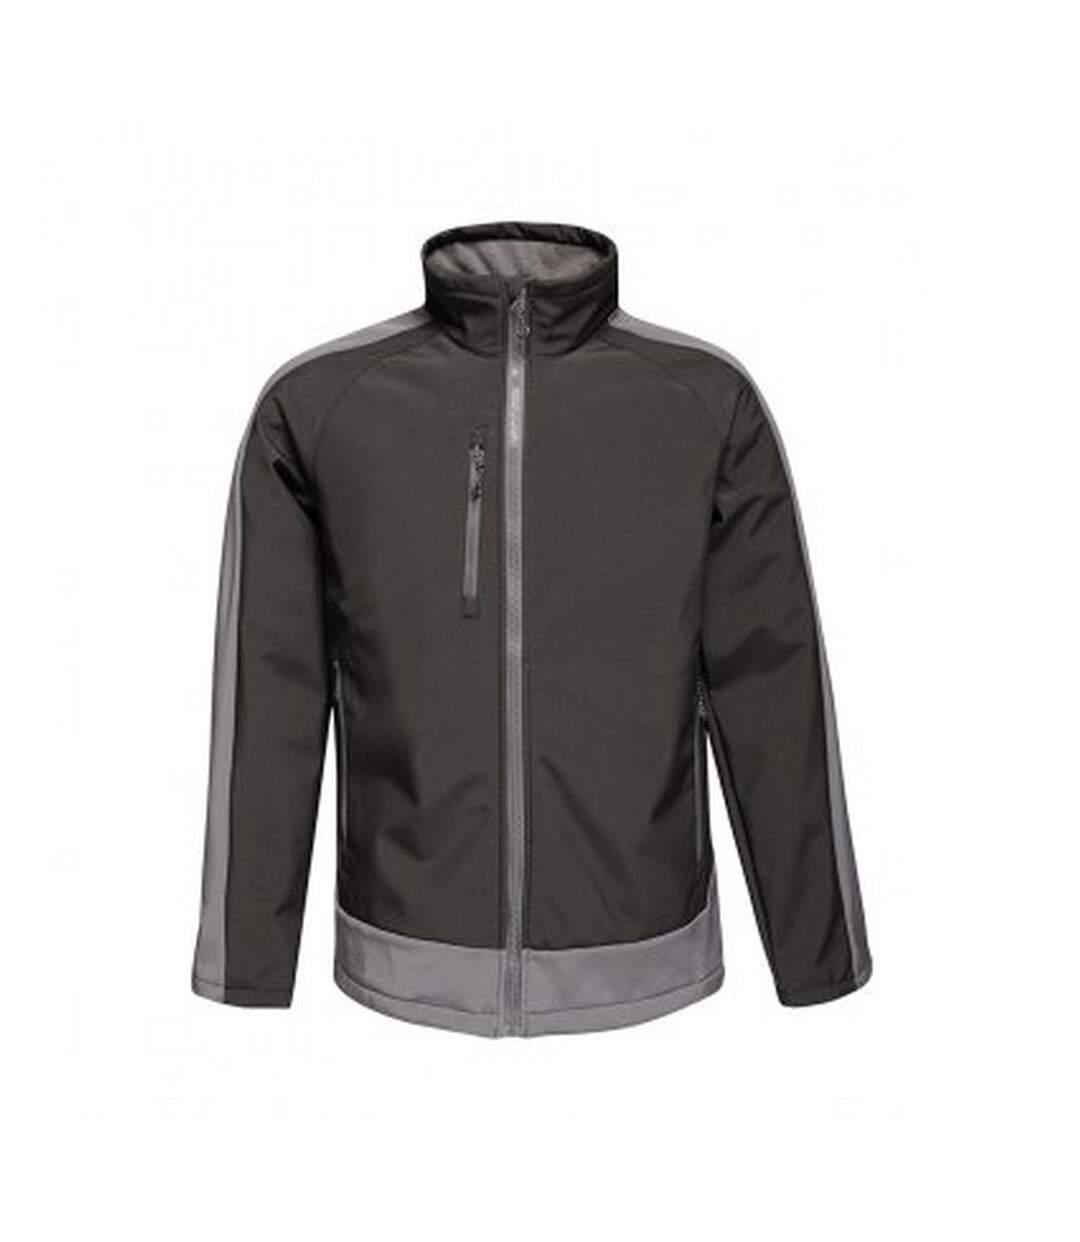 Regatta  Mens Contrast Three Layer Printable Soft Shell Jacket (Black/Seal Grey) - UTPC3318